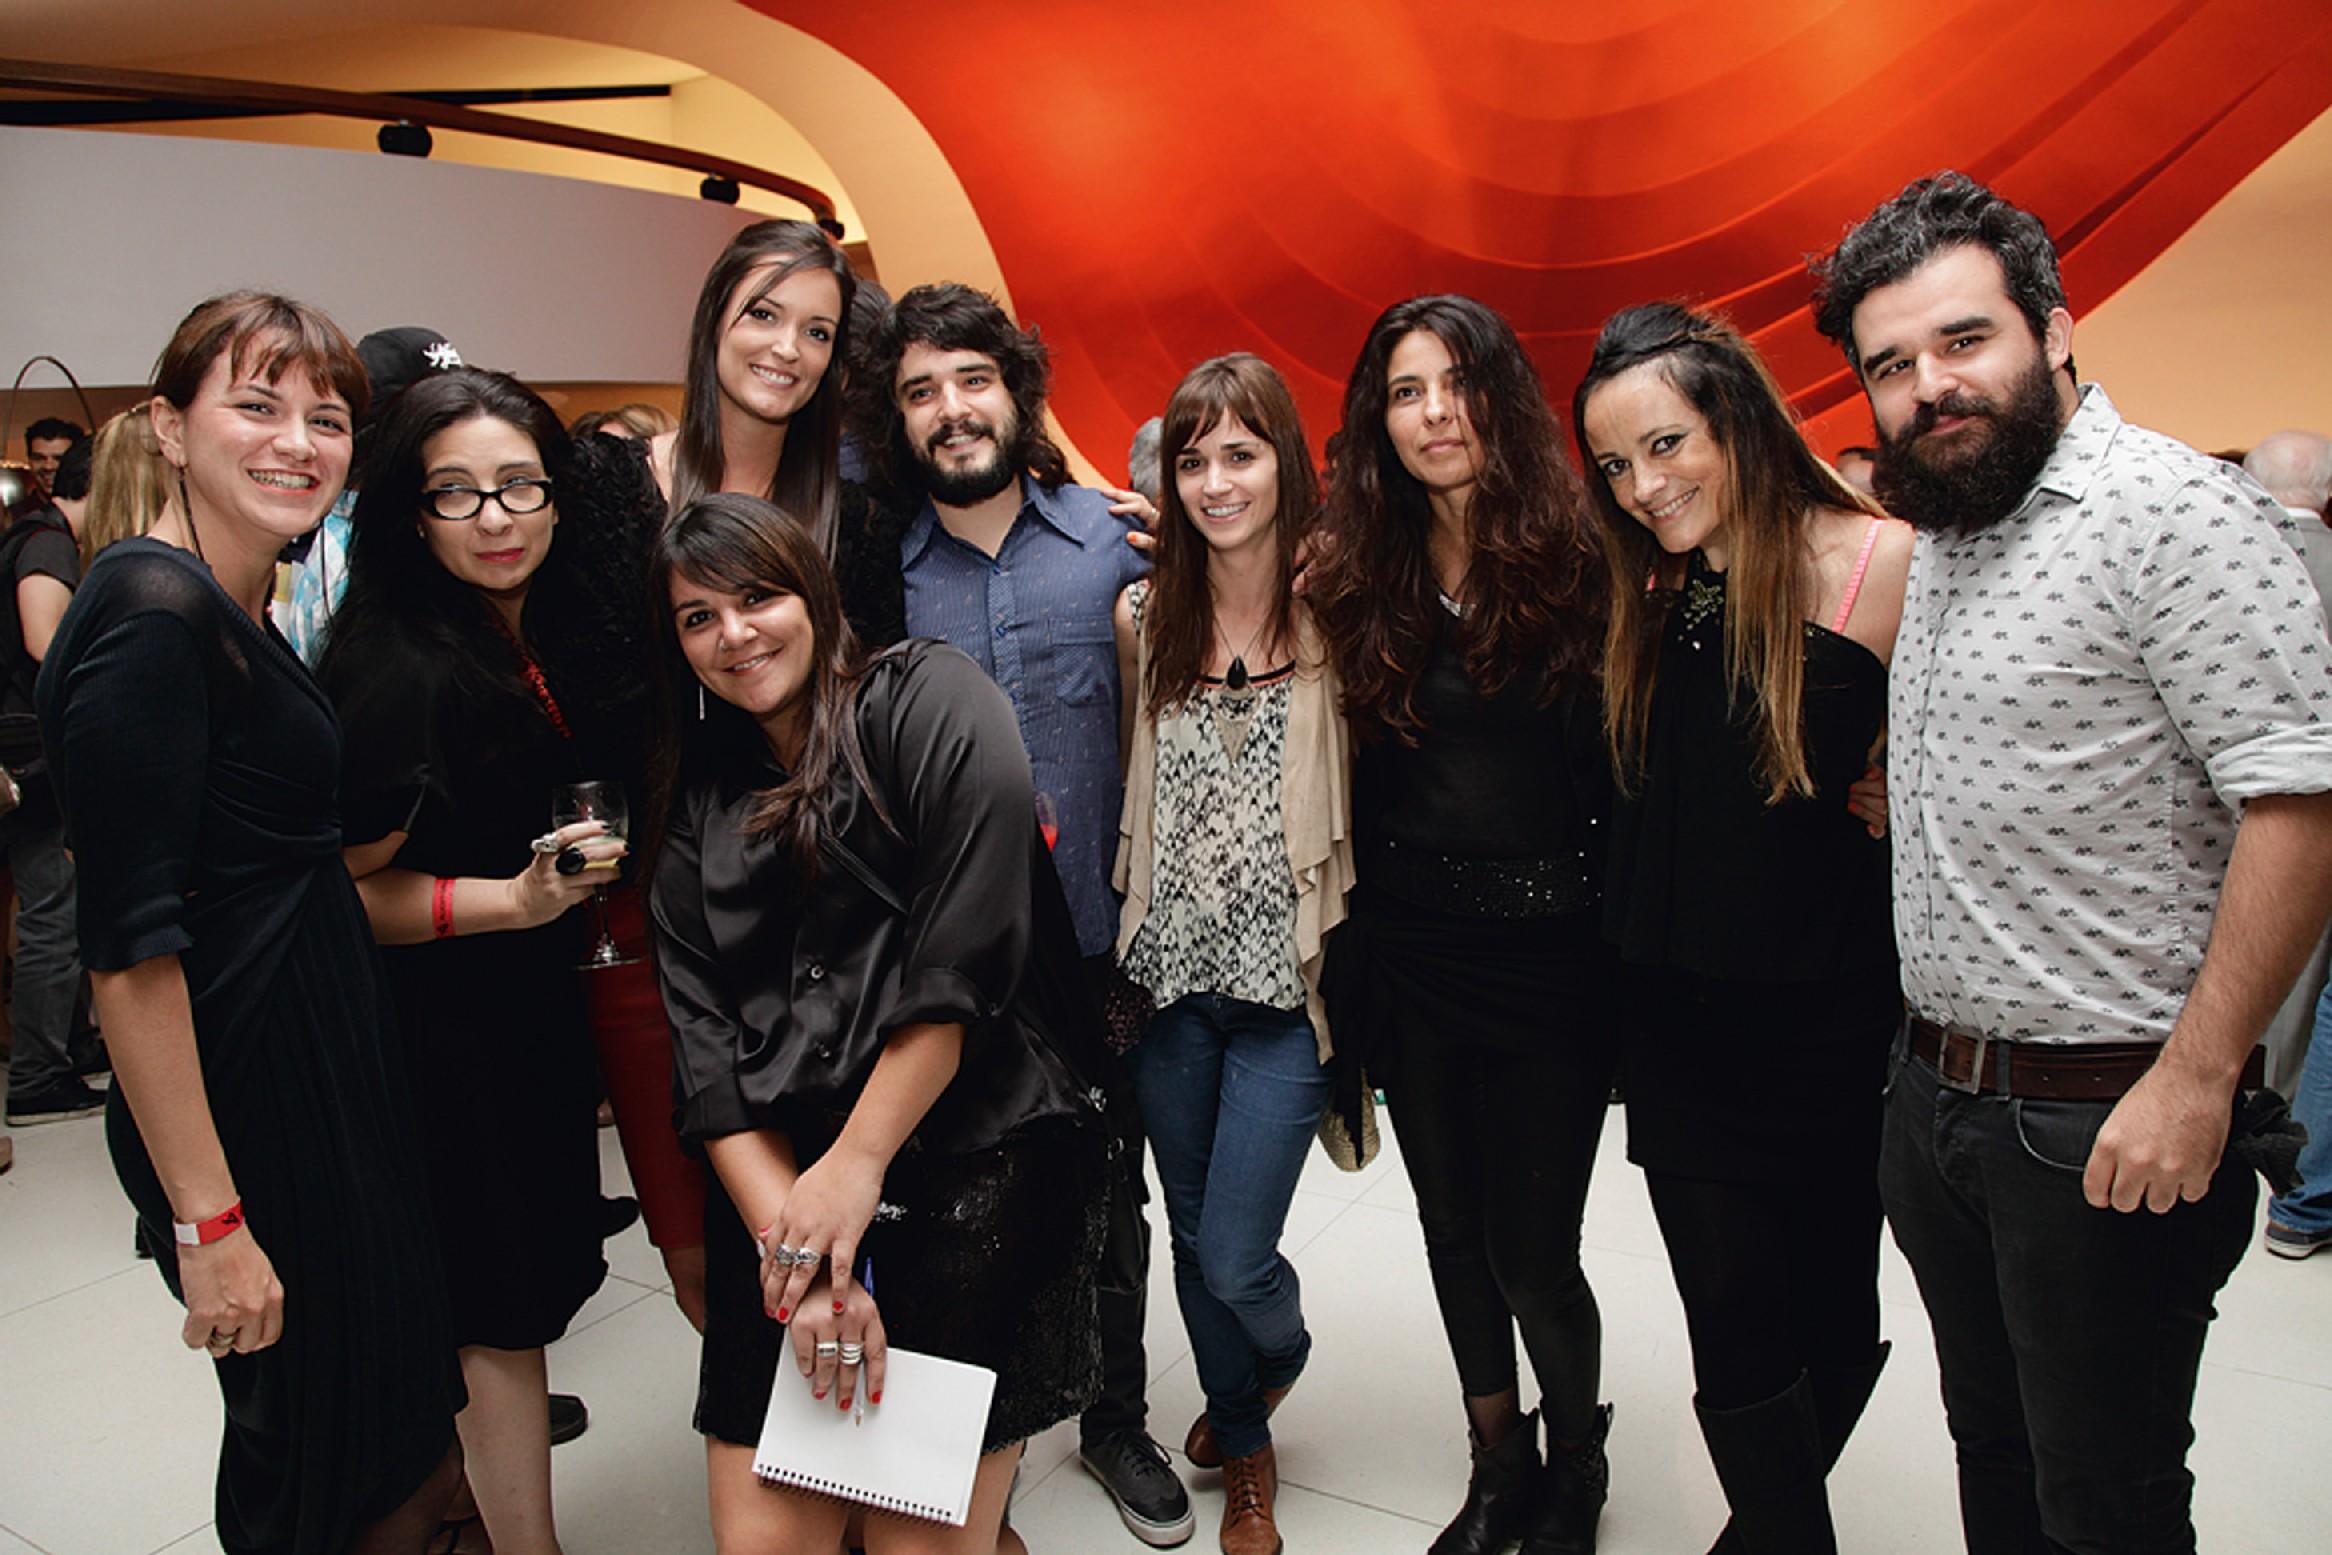 Anabelle Custódio, Eva Uviedo, Katia Lessa, Flavia Fraccaroli, Elohim Barros, Renata Mein, Renata Zincone e Adriana Verani